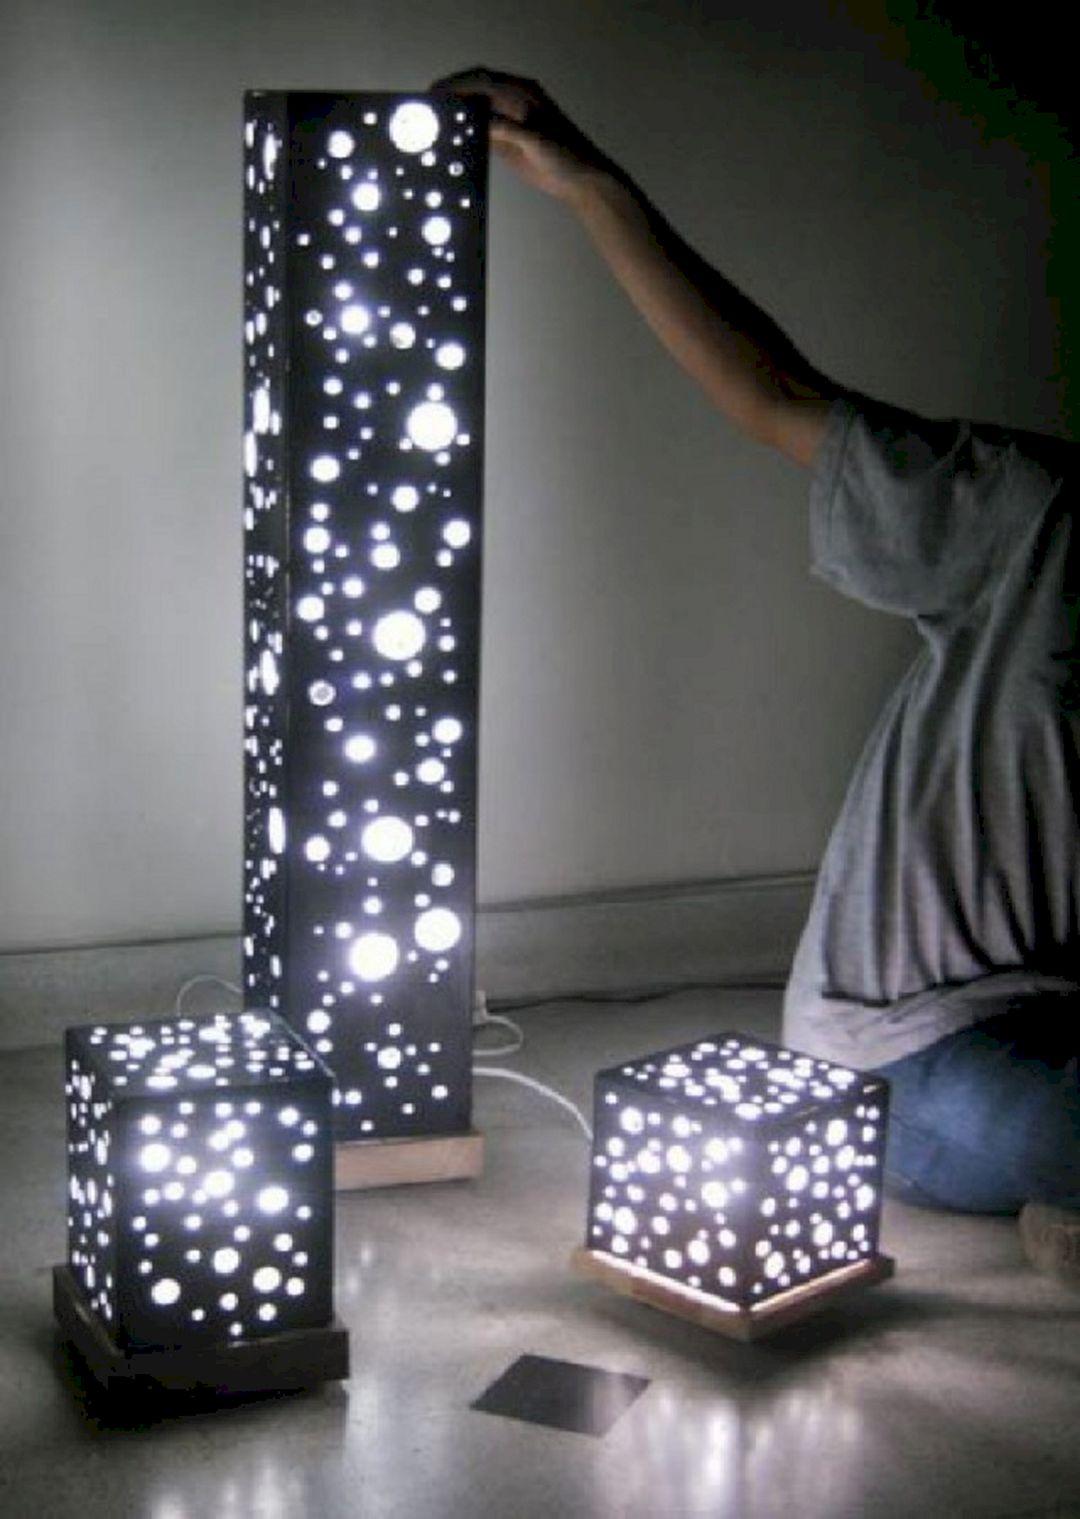 DIY Homemade Lamp Design ideas